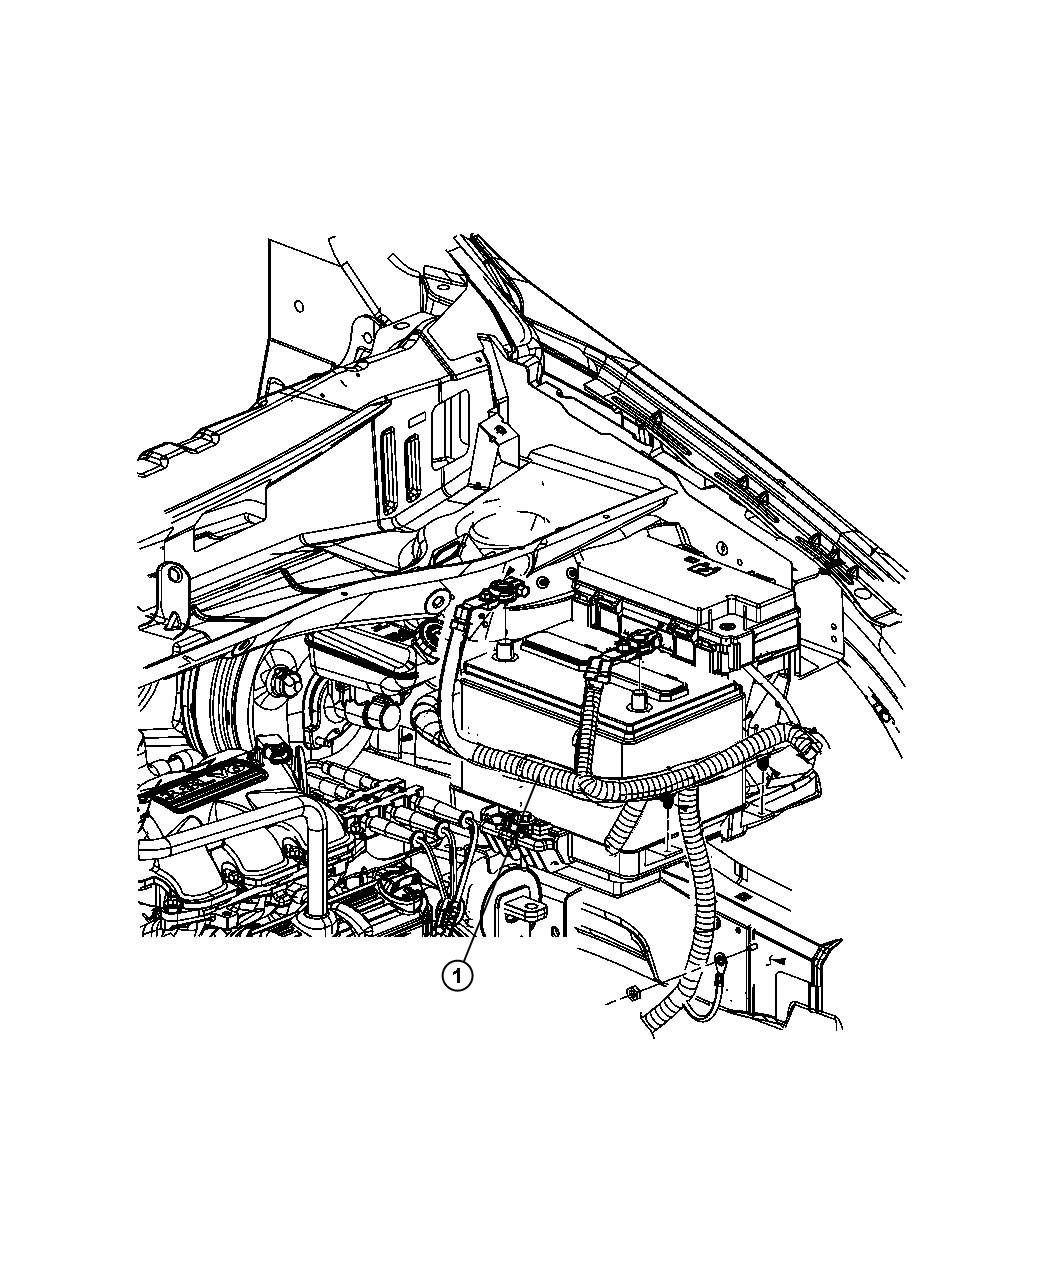 2011 dodge grand caravan terminal battery negative. Black Bedroom Furniture Sets. Home Design Ideas